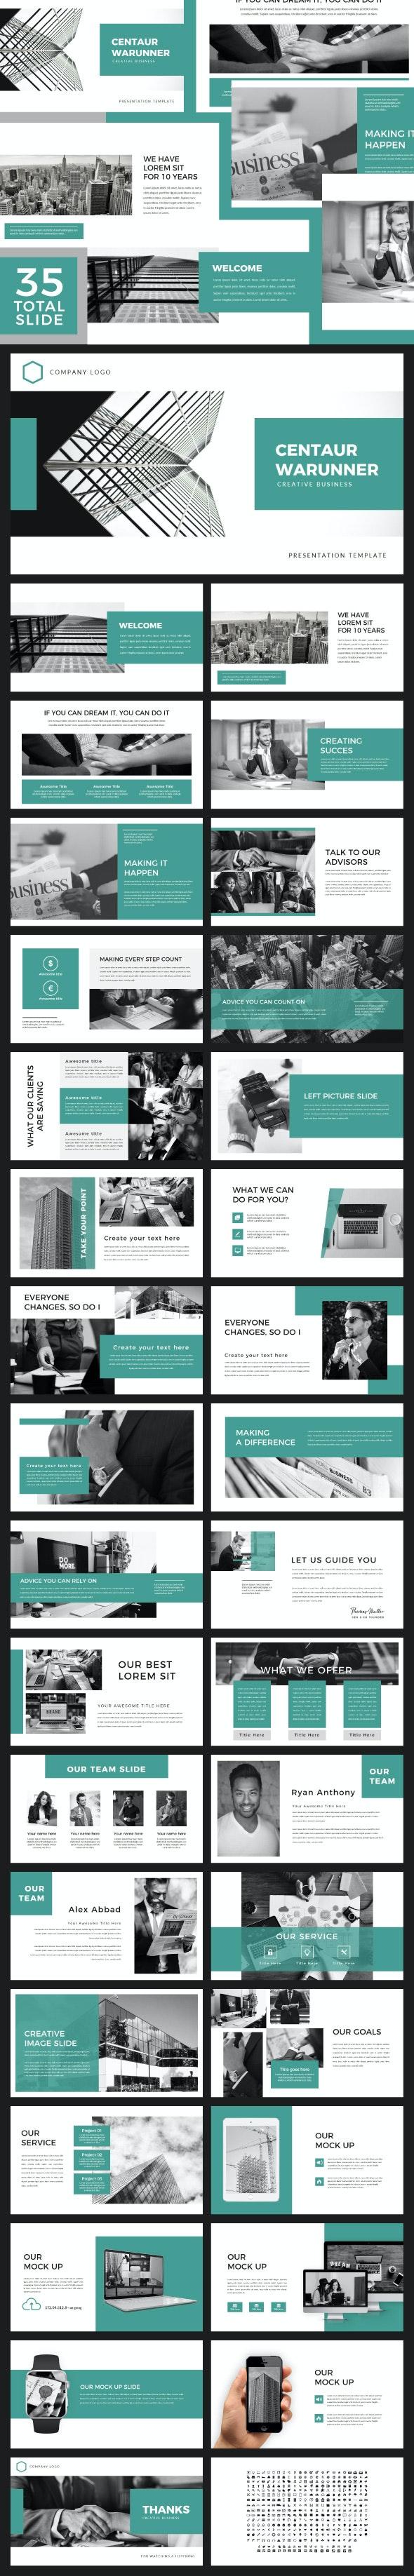 Centaur - PowerPoint - Business PowerPoint Templates